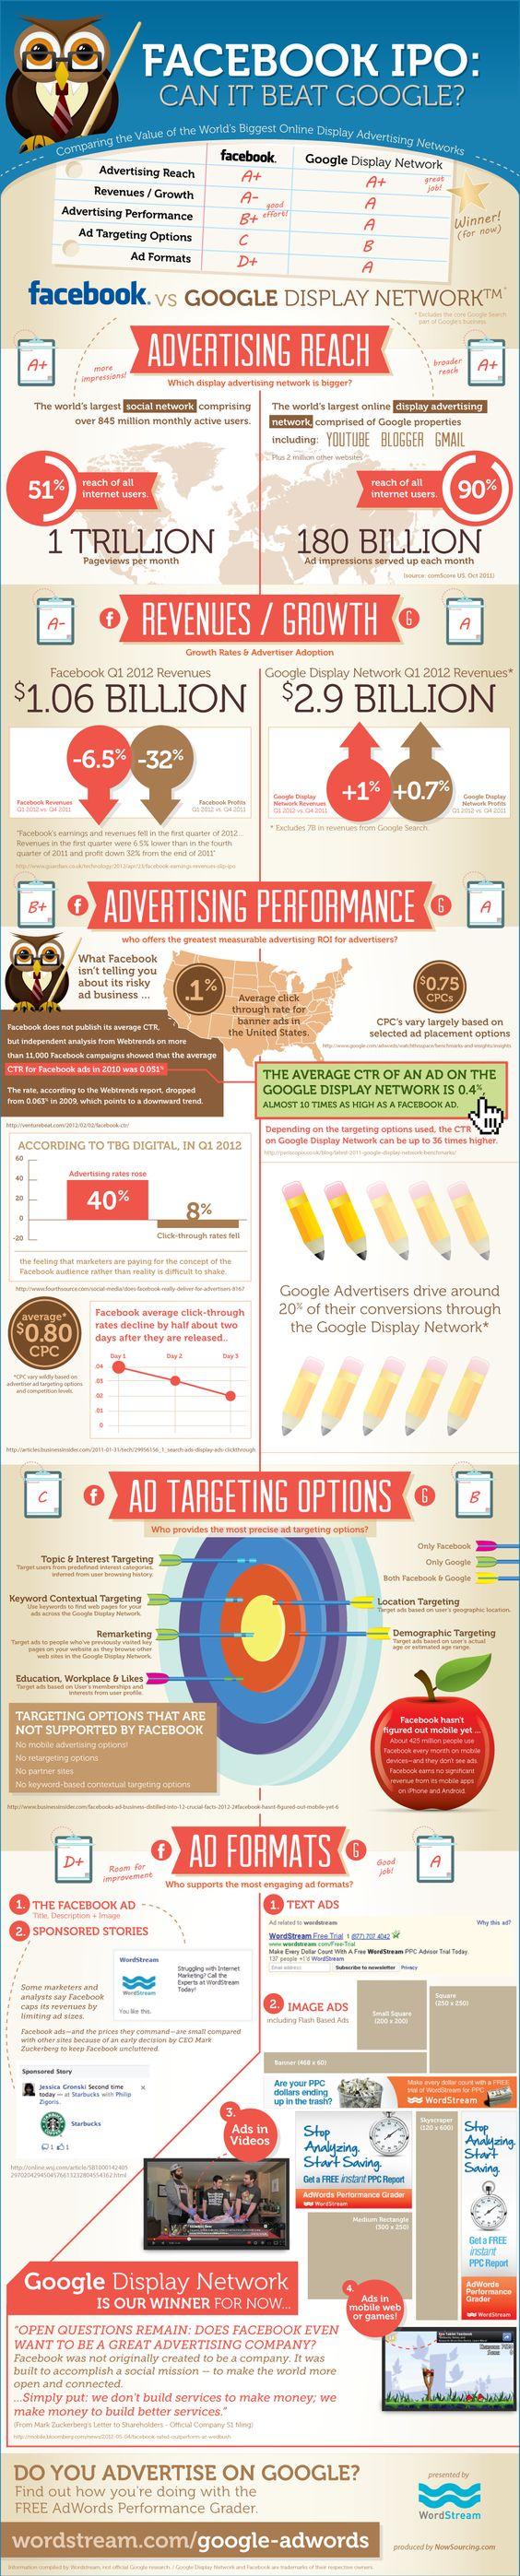 Facebook Advertising vs. AdWords